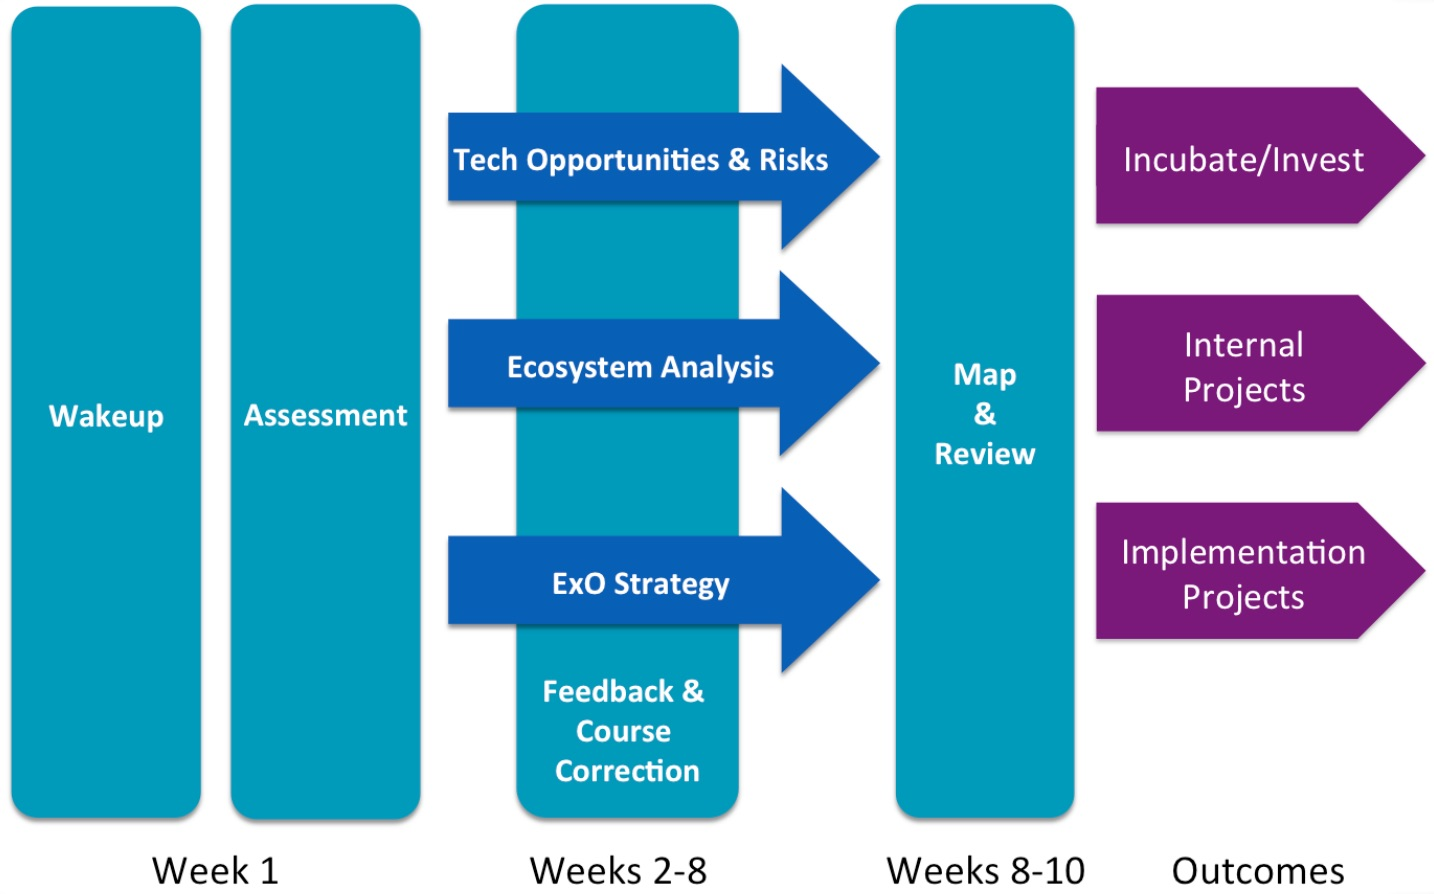 Fig 1. - Typical ExO Sprint Structural Framework